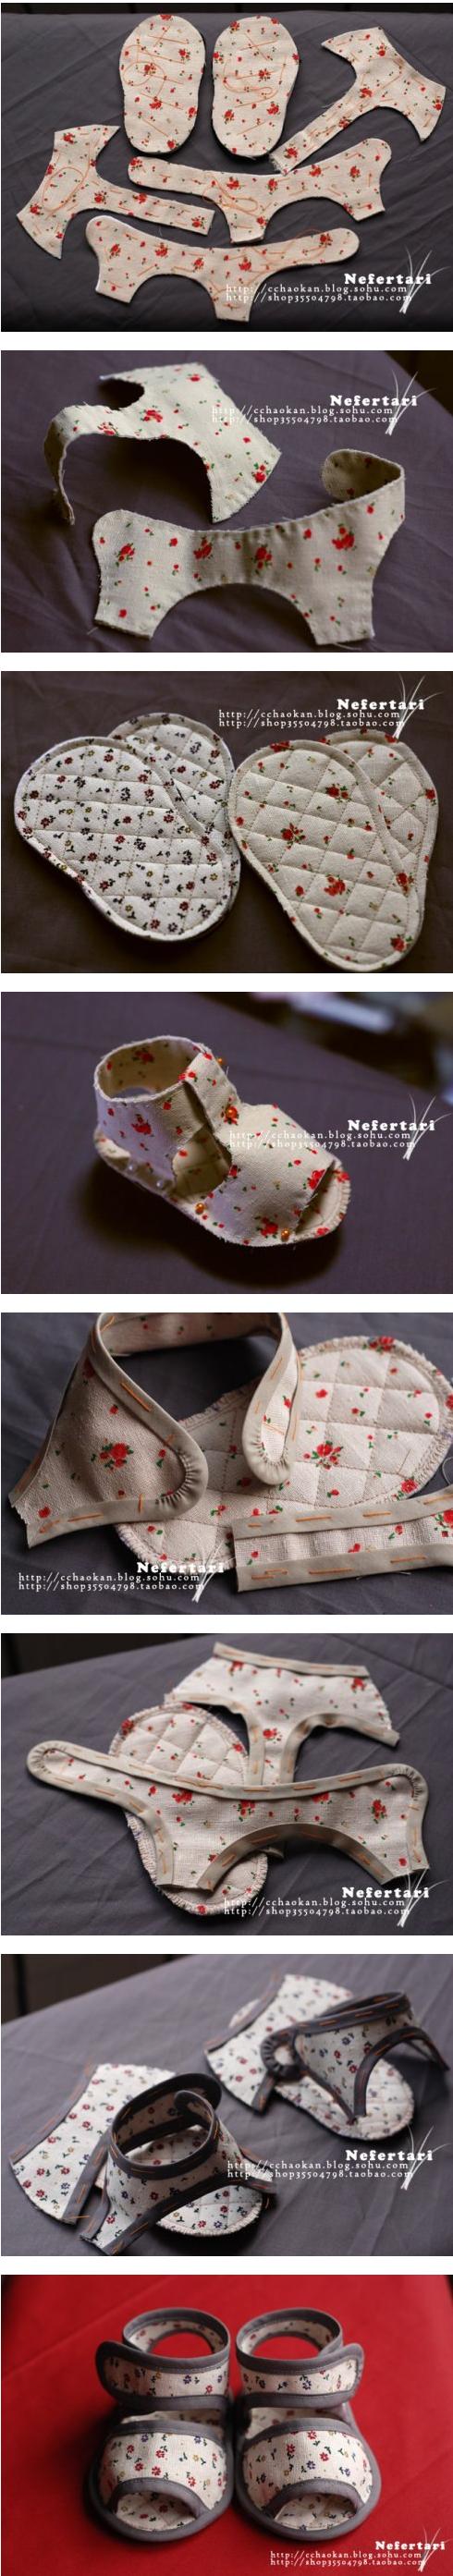 a076fa5ff2768 Como hacer zapatos de bebe con tela reciclada